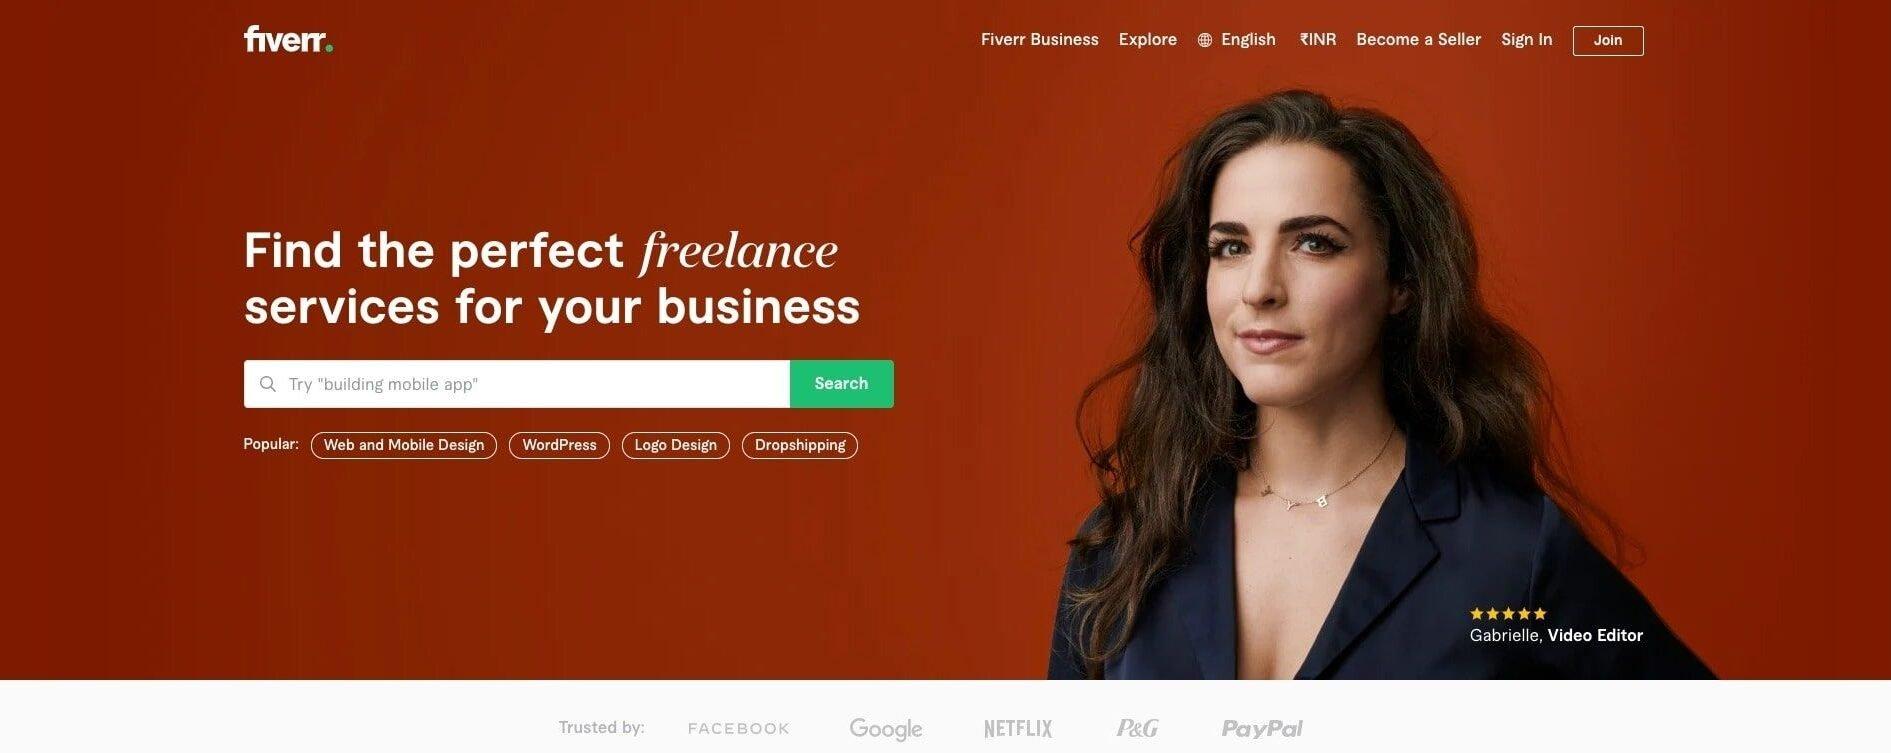 Fiverr - Freelance Services Marketplace for Businesses copy